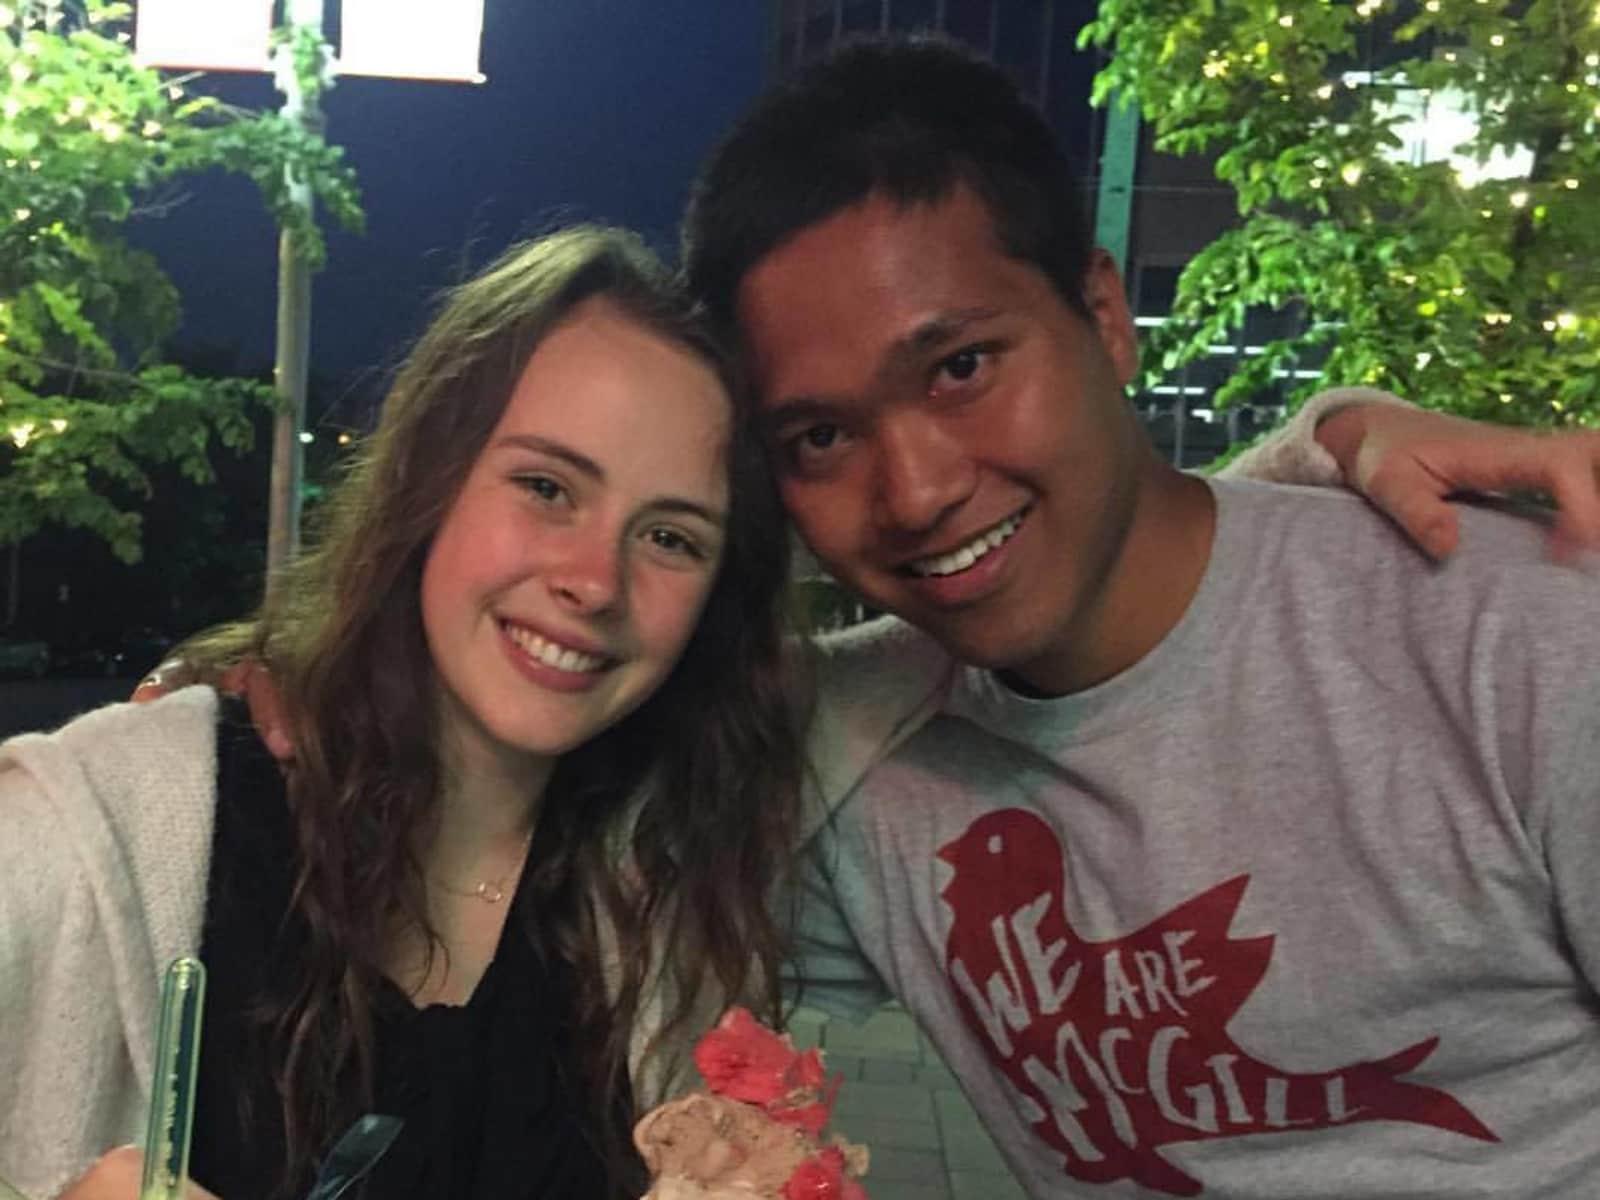 Pierre-quan & Francesca from Montréal, Quebec, Canada